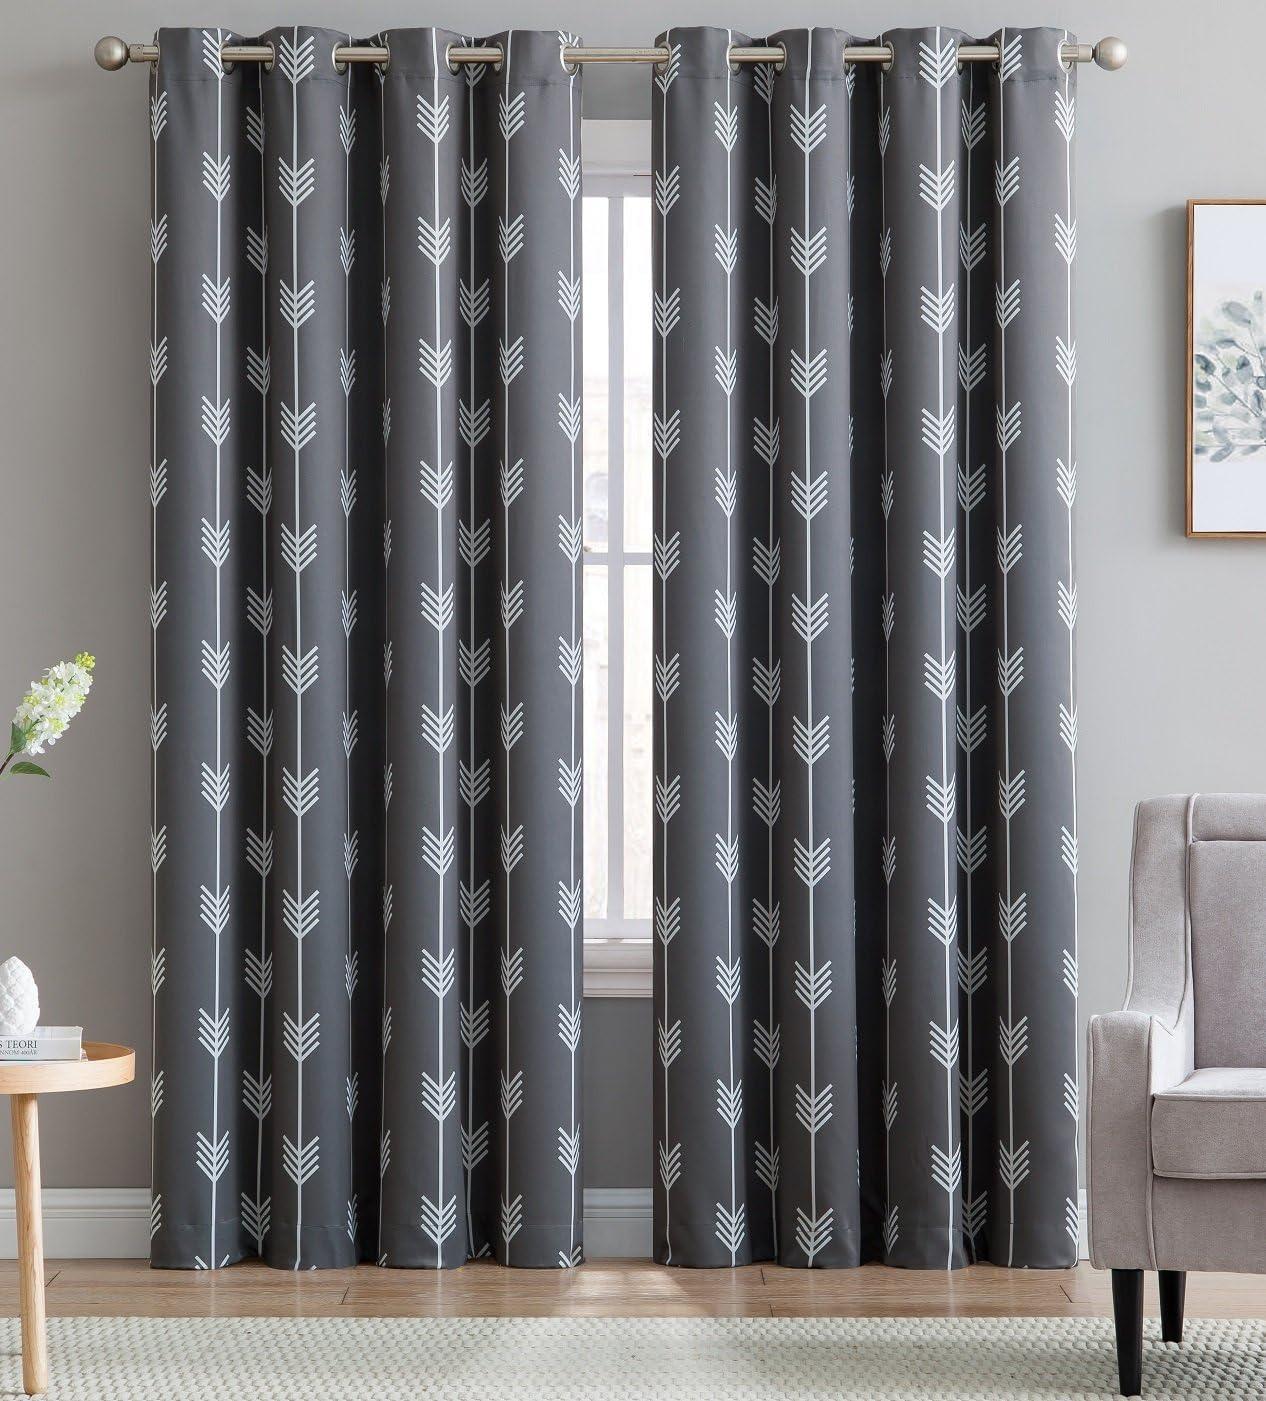 "HLC.ME Arrow Printed Blackout Room Darkening Thermal Grommet Window Curtain Drape Panels for Bedroom - Set of 2 - Grey - 96"" inch Long"